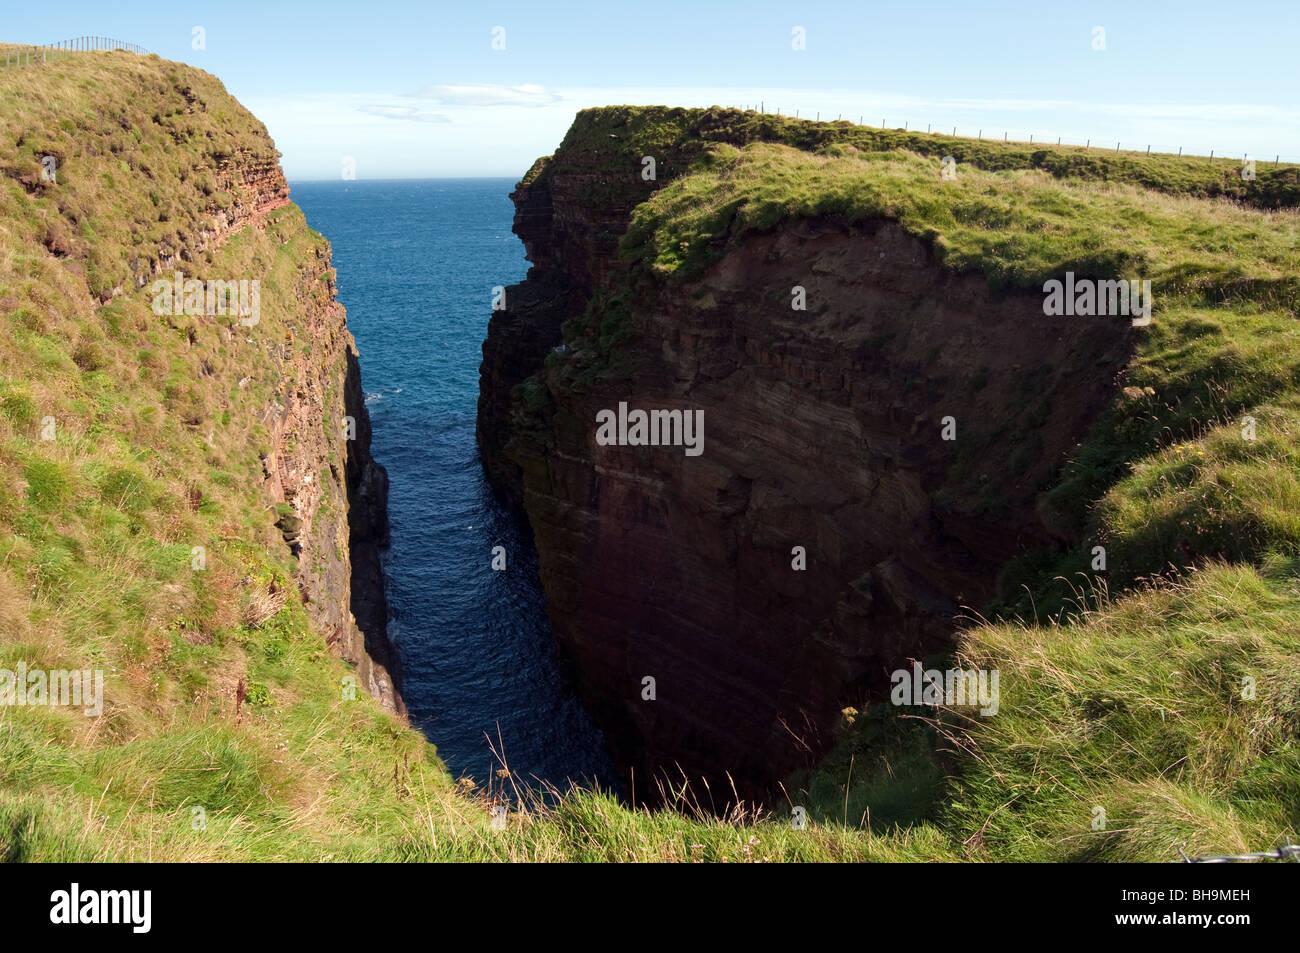 Geo Sclaites Rock Cleft Stockbild